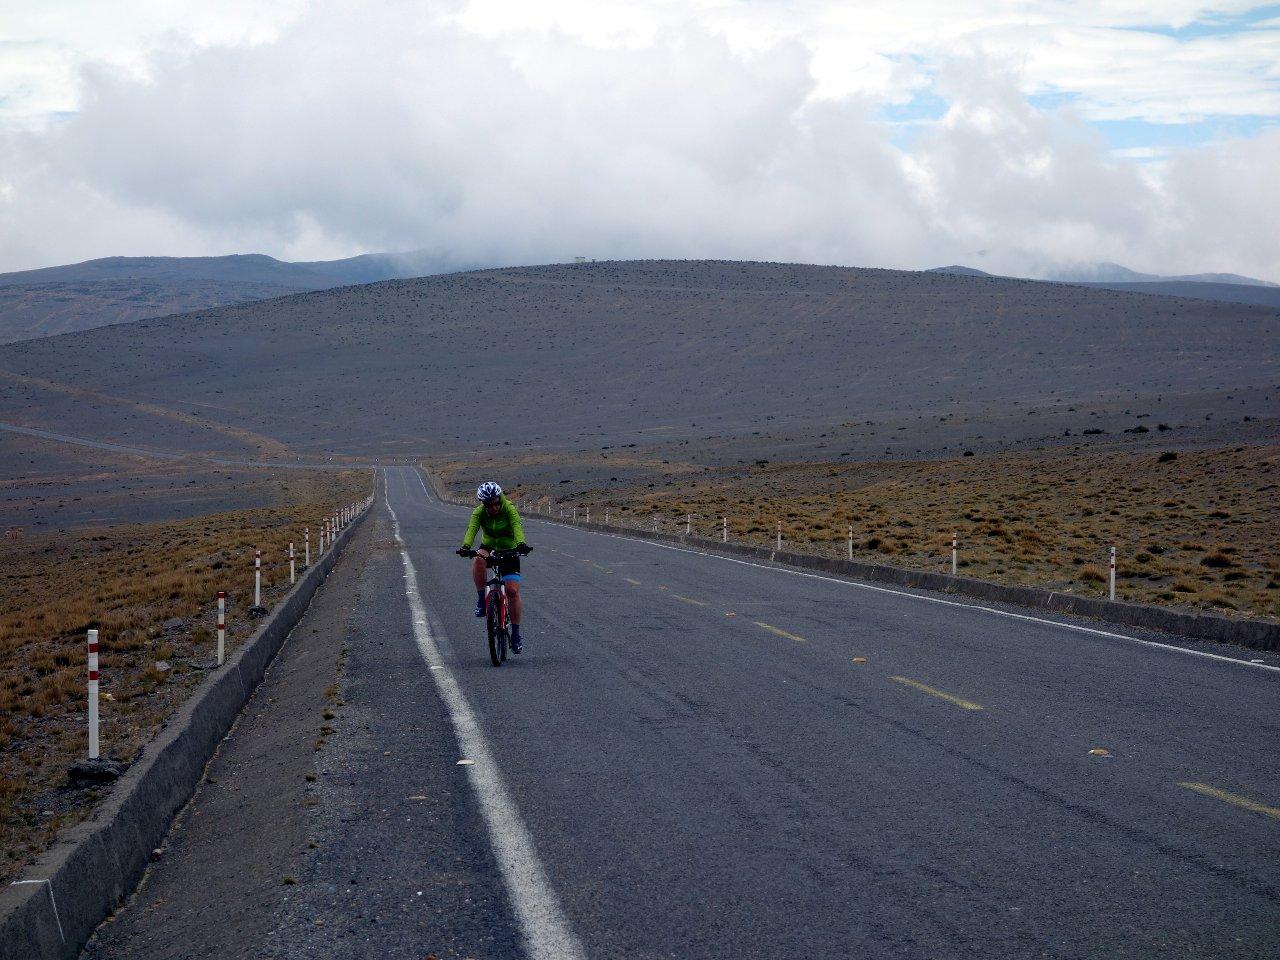 Desolate landscape on the western side of Chimborazo